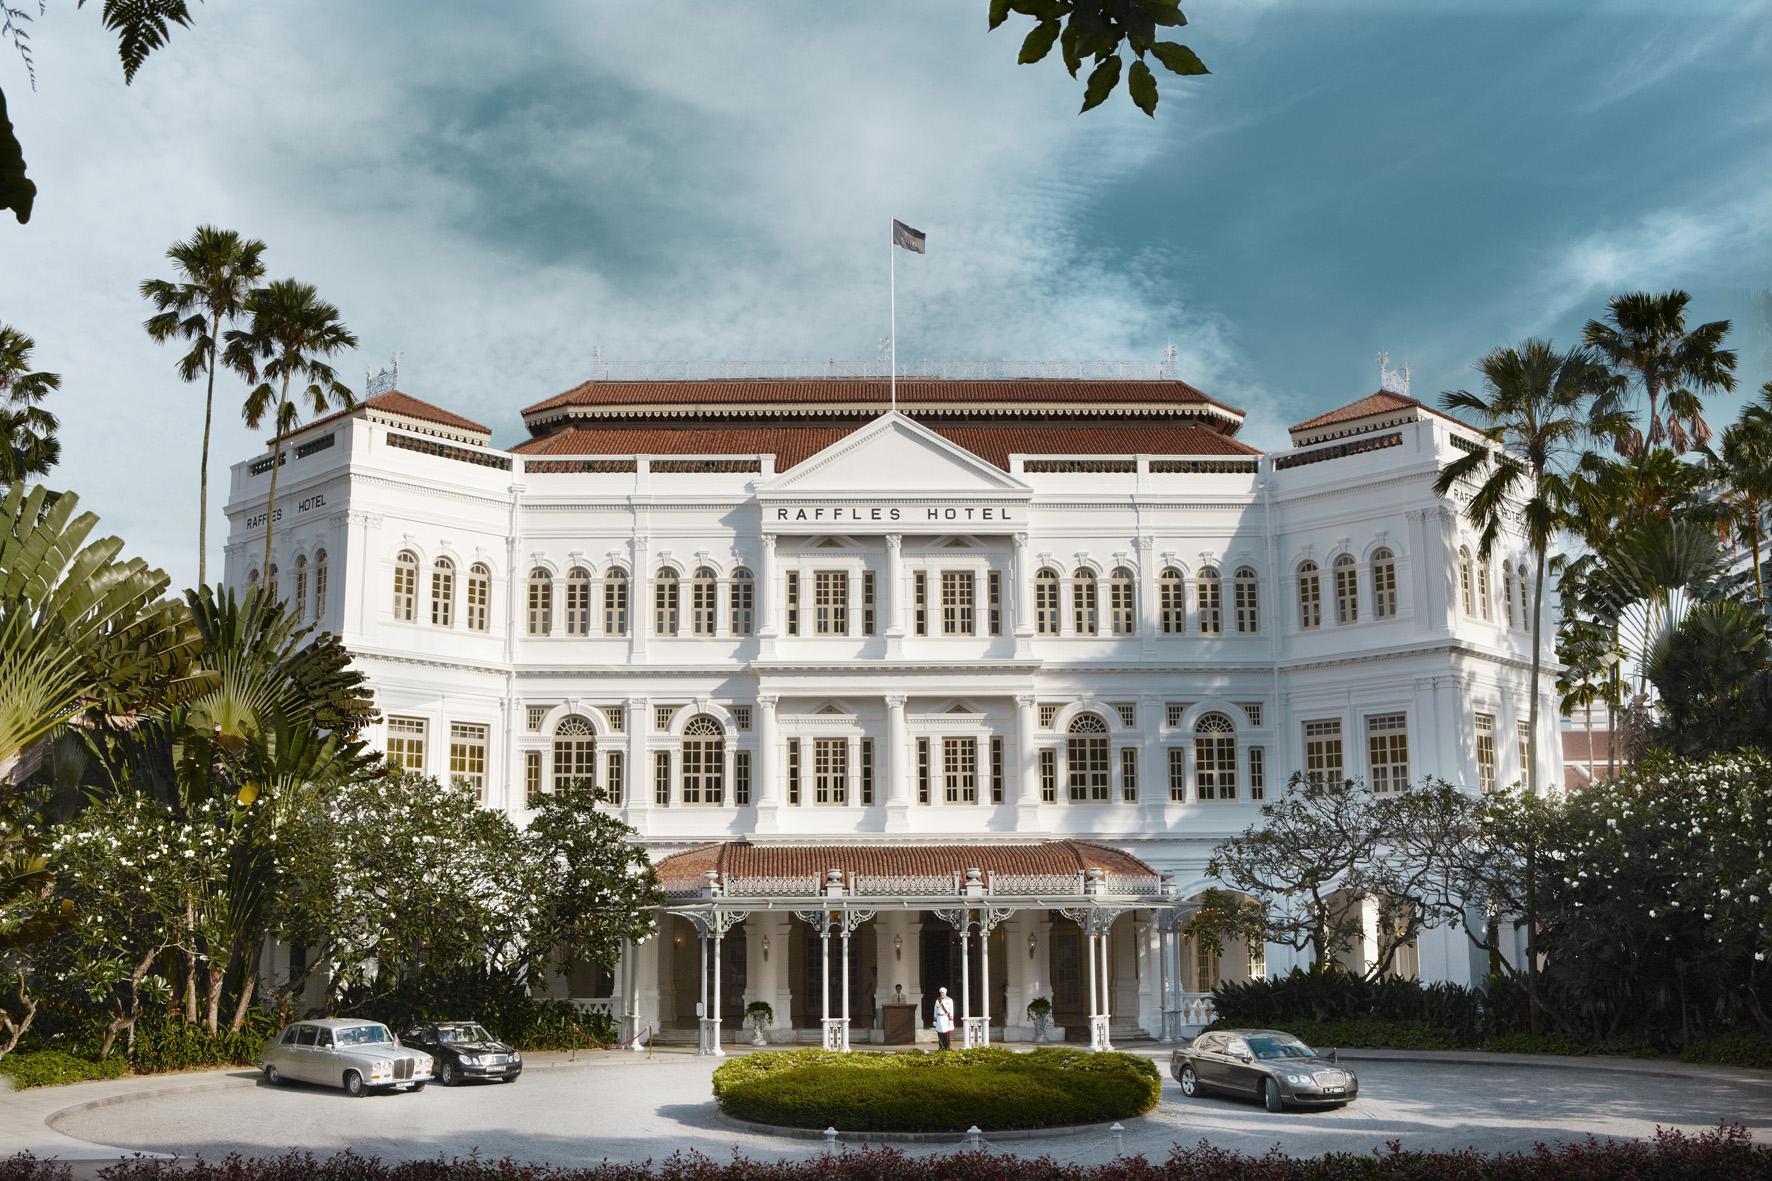 Raffles Hotel Singapore - Hotel Facade 1